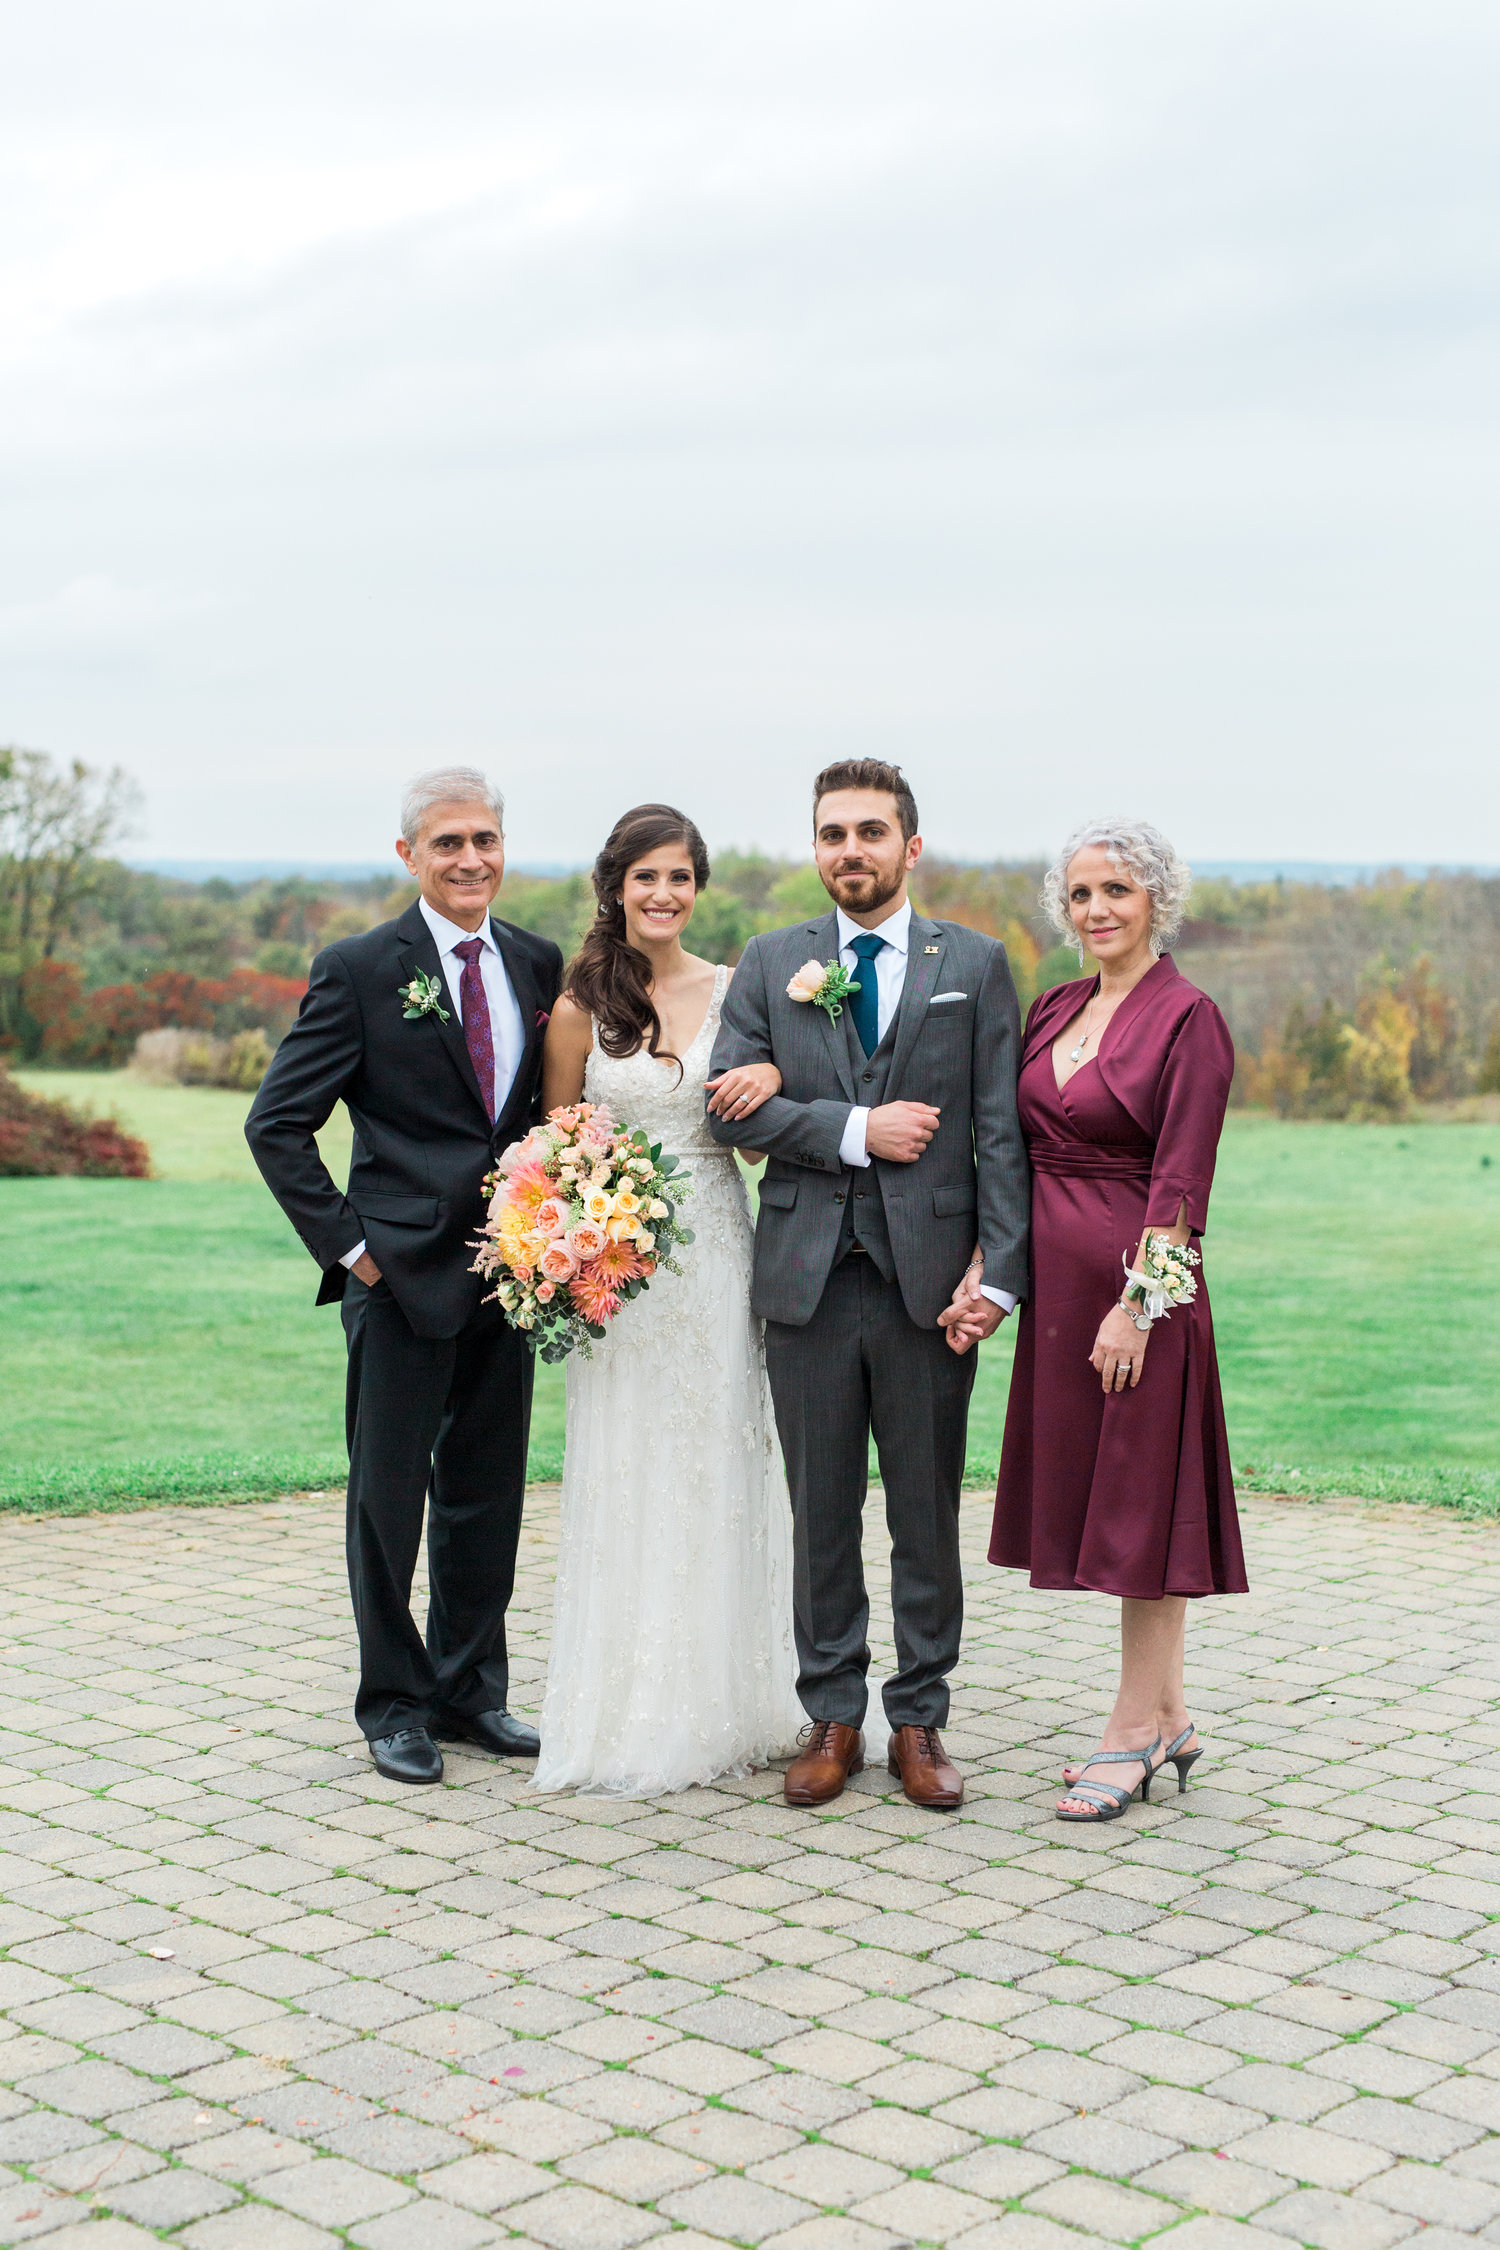 Amir-Golbazi-Danielle-Giroux-Photography_Toronto-Wedding_Cedarwood_Rachel-Paul_378.jpg